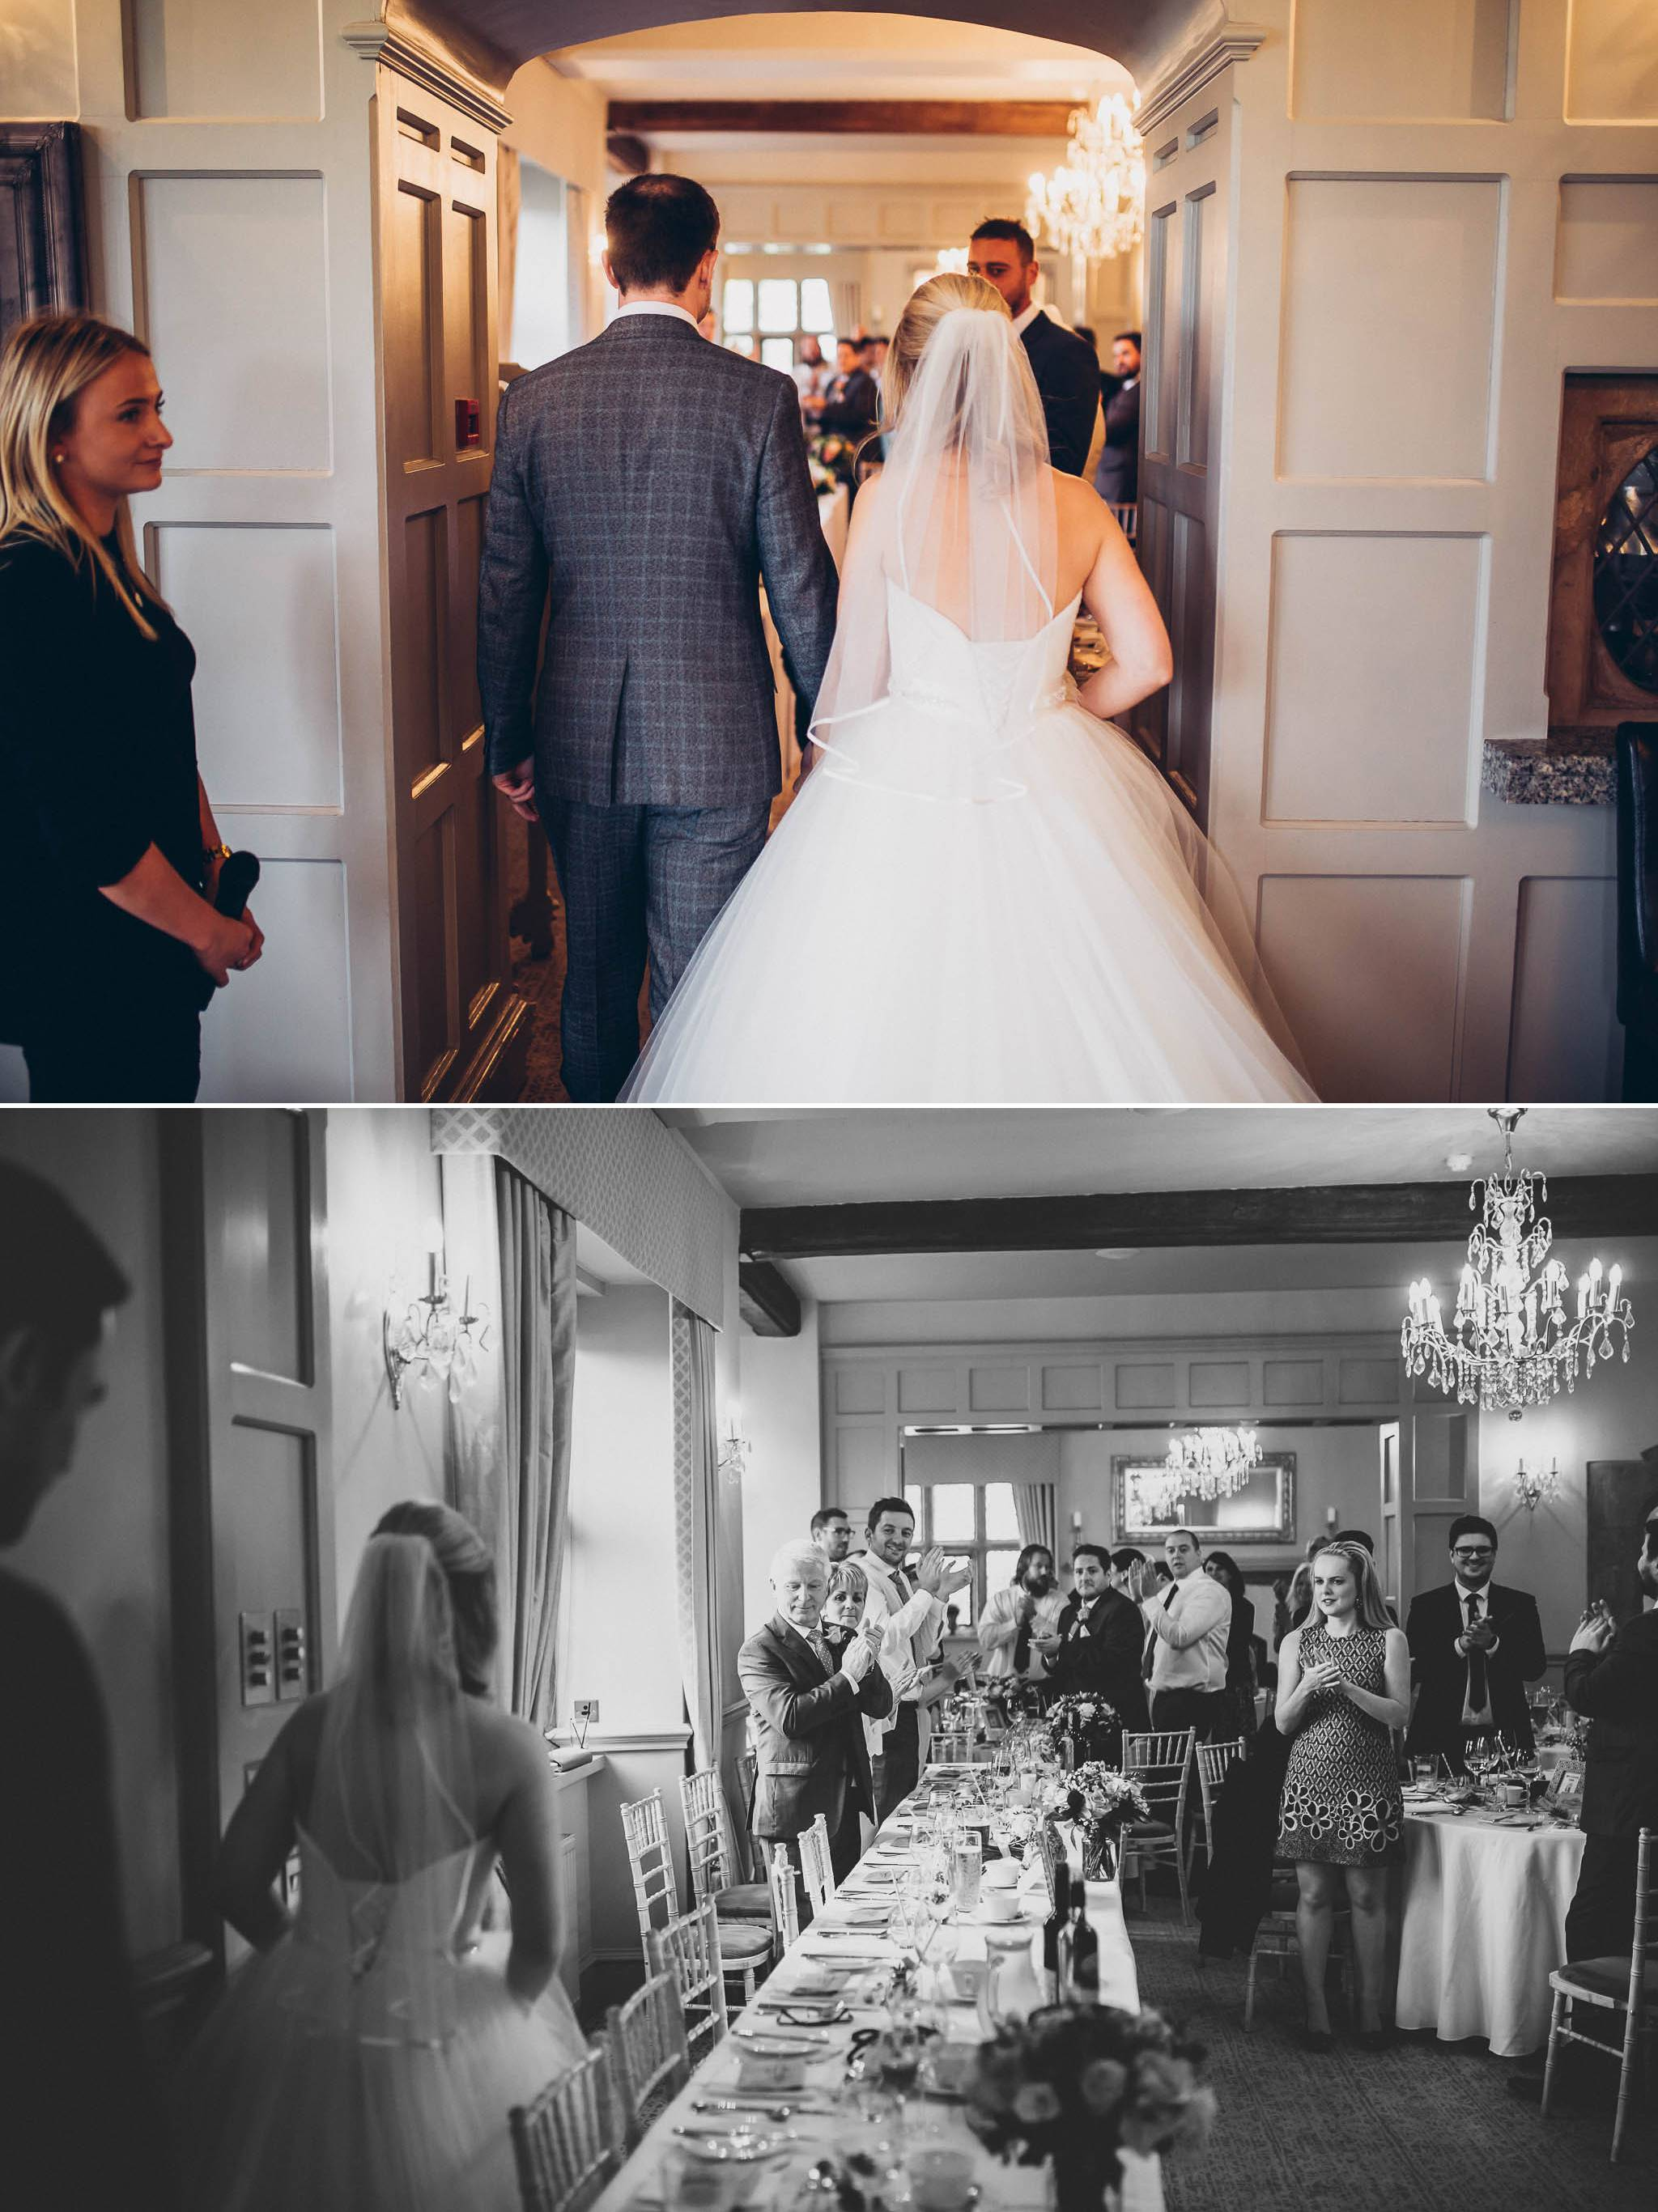 weston-hall-wedding-photographer 16.jpg